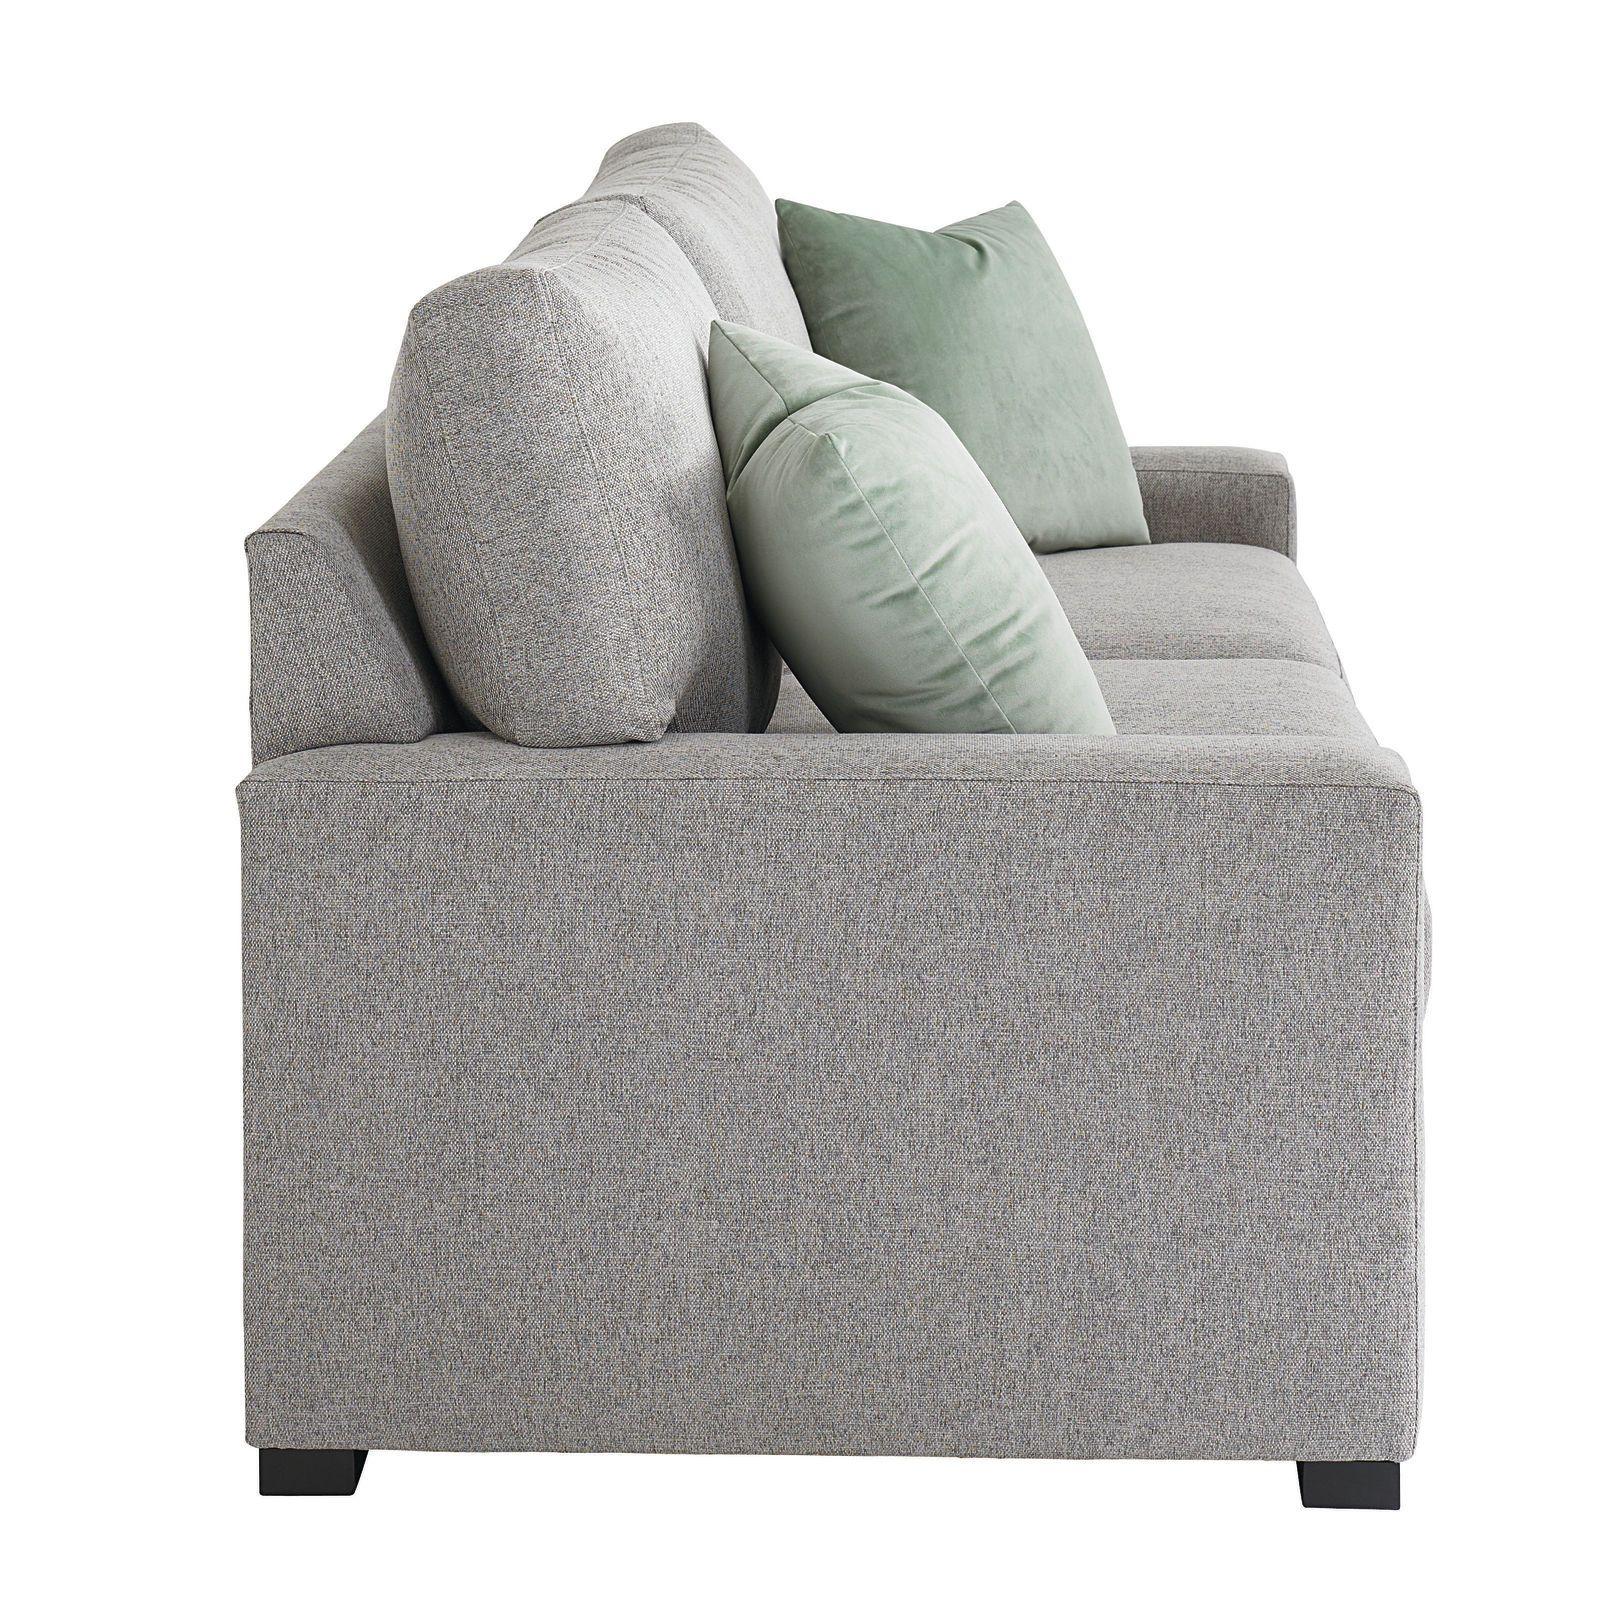 Braylen Sofa Sofa, Seat cushions, Living room